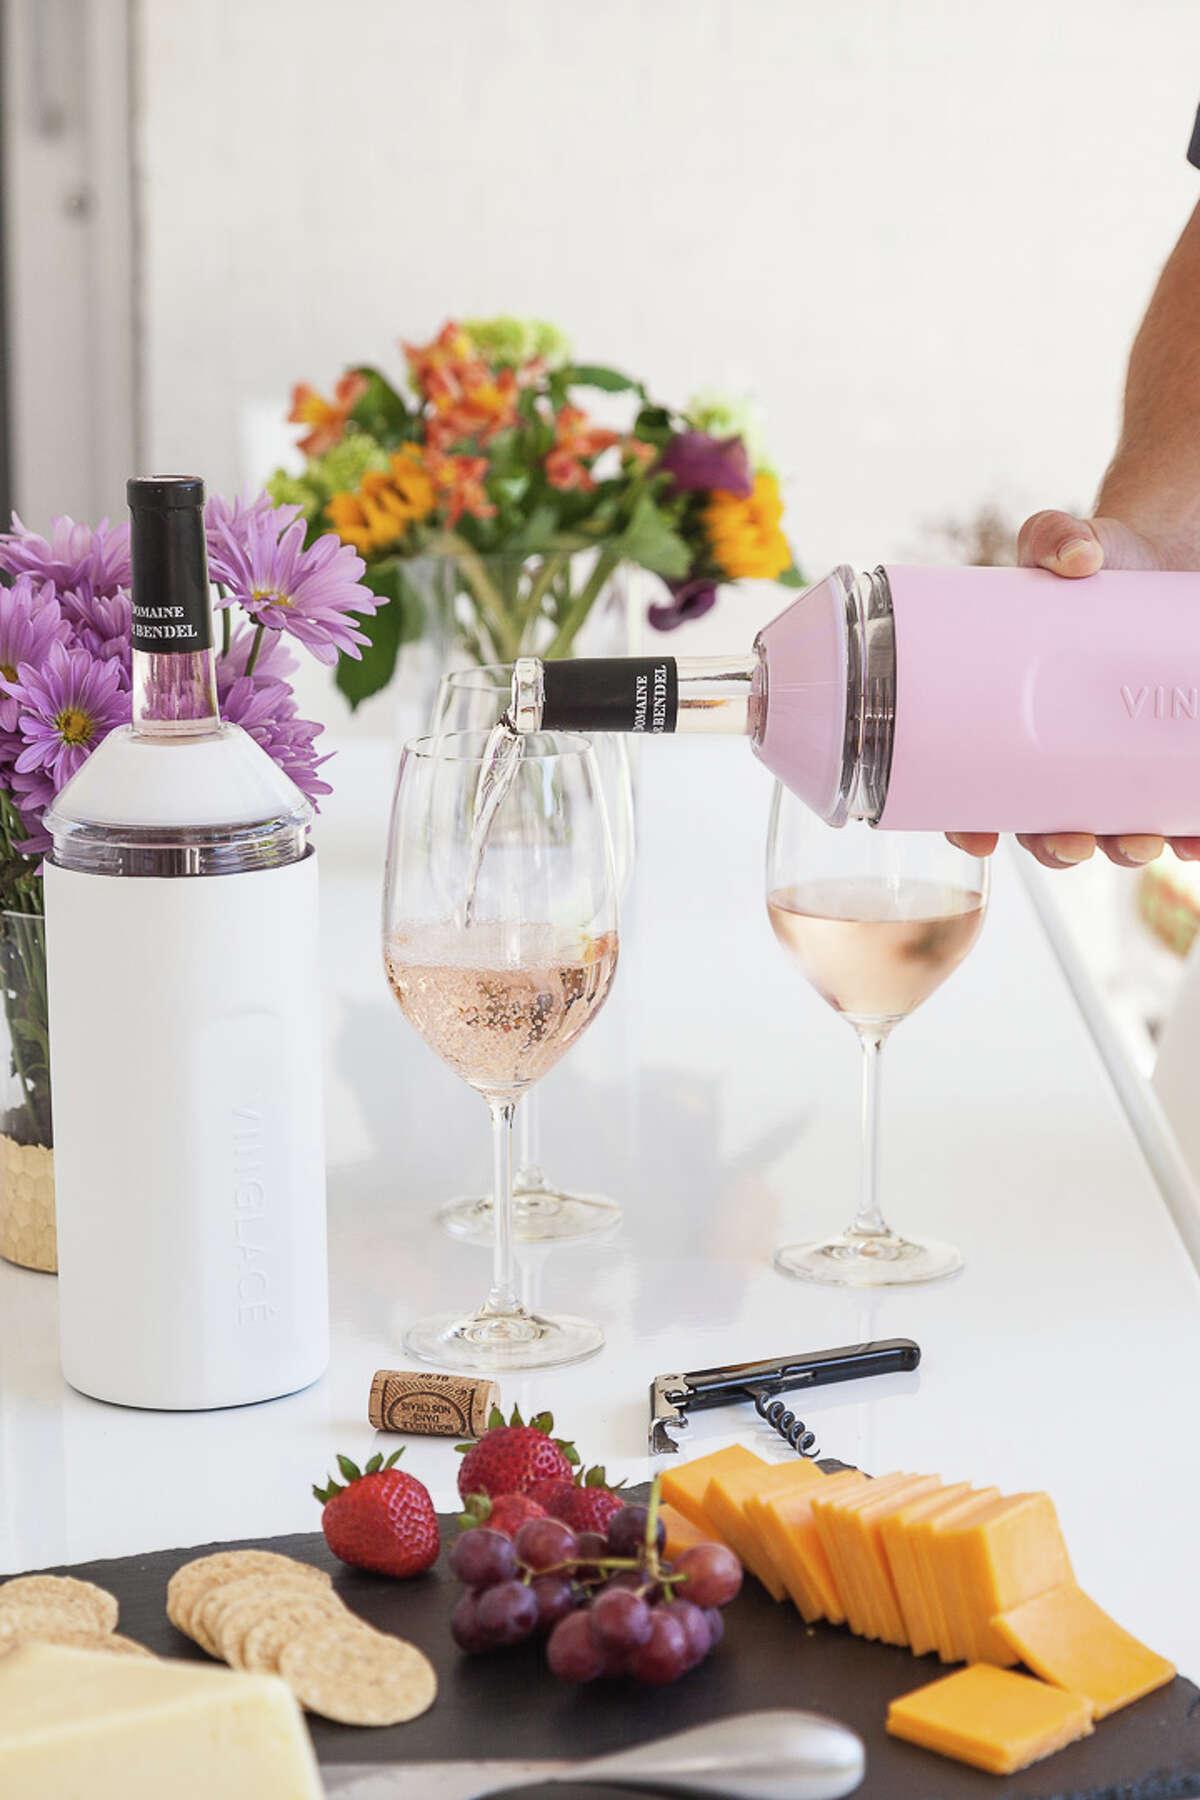 Vinglace wine insulators keep bottles of wine at proper temperature.